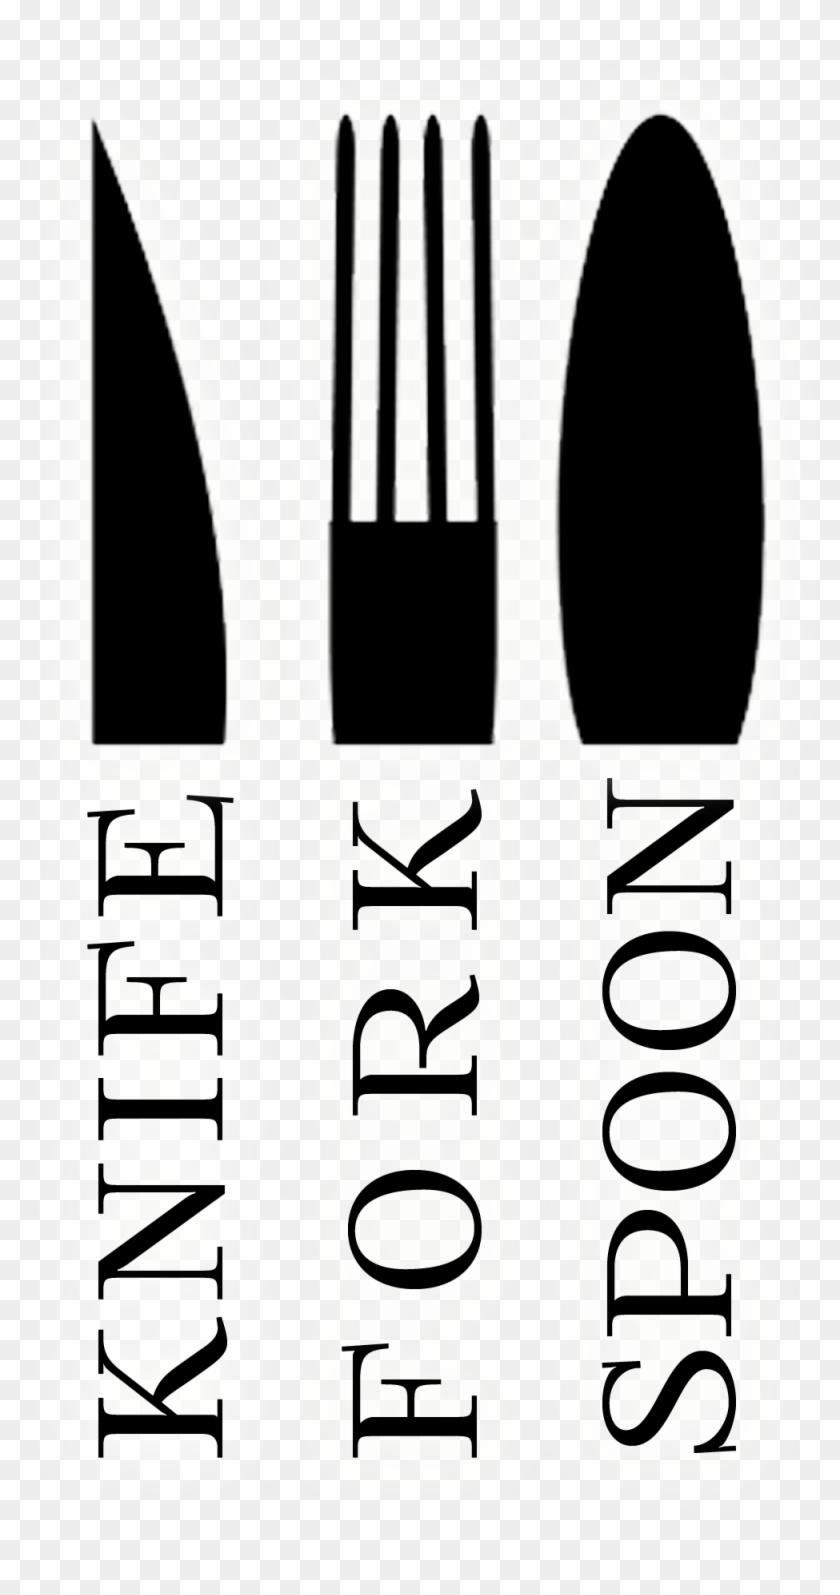 Knife Fork & Spoon - Knife Fork Spoon Clipart #547044